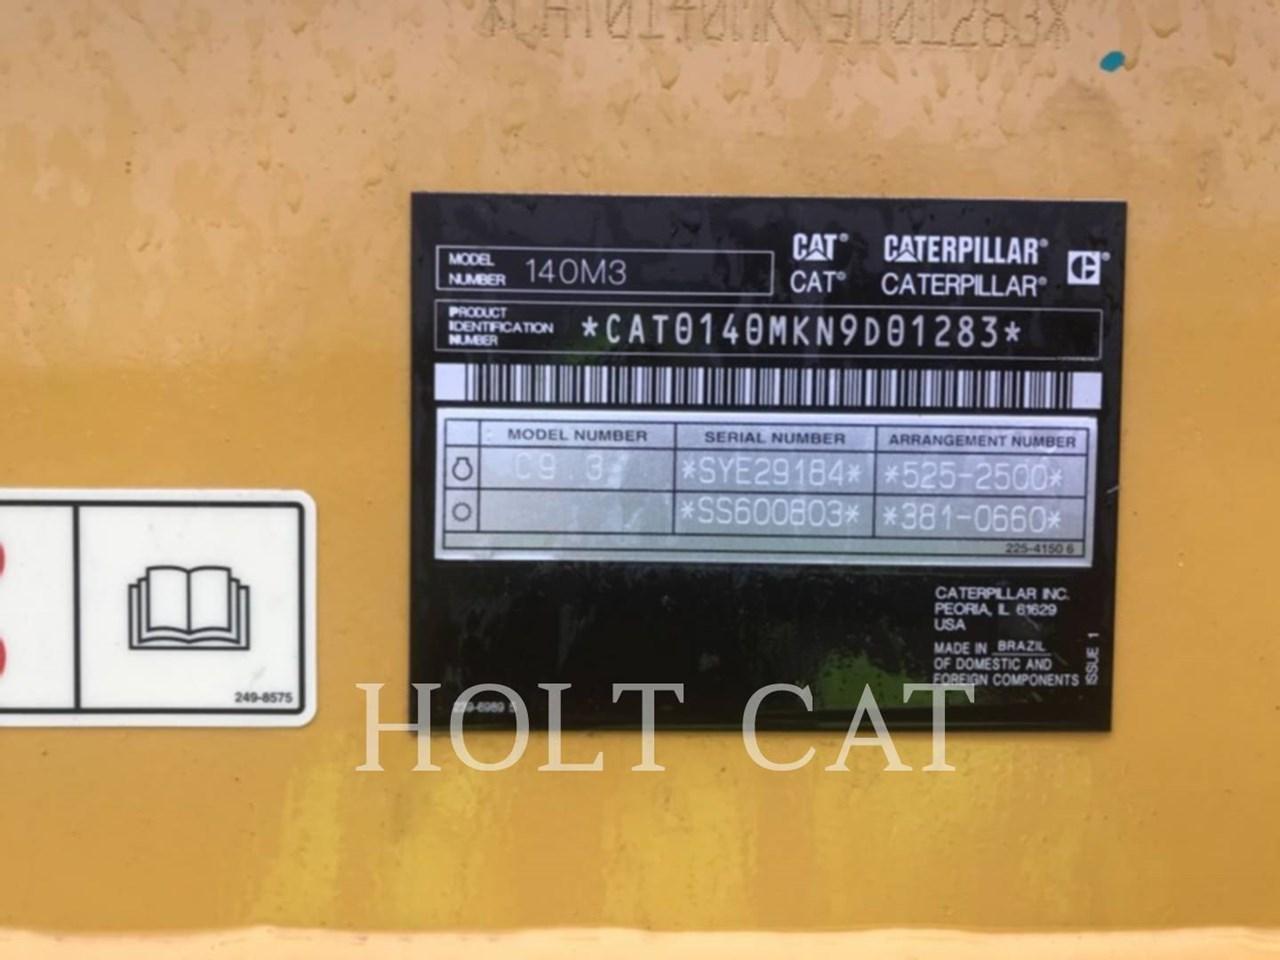 2019 Caterpillar 140M3 Image 6